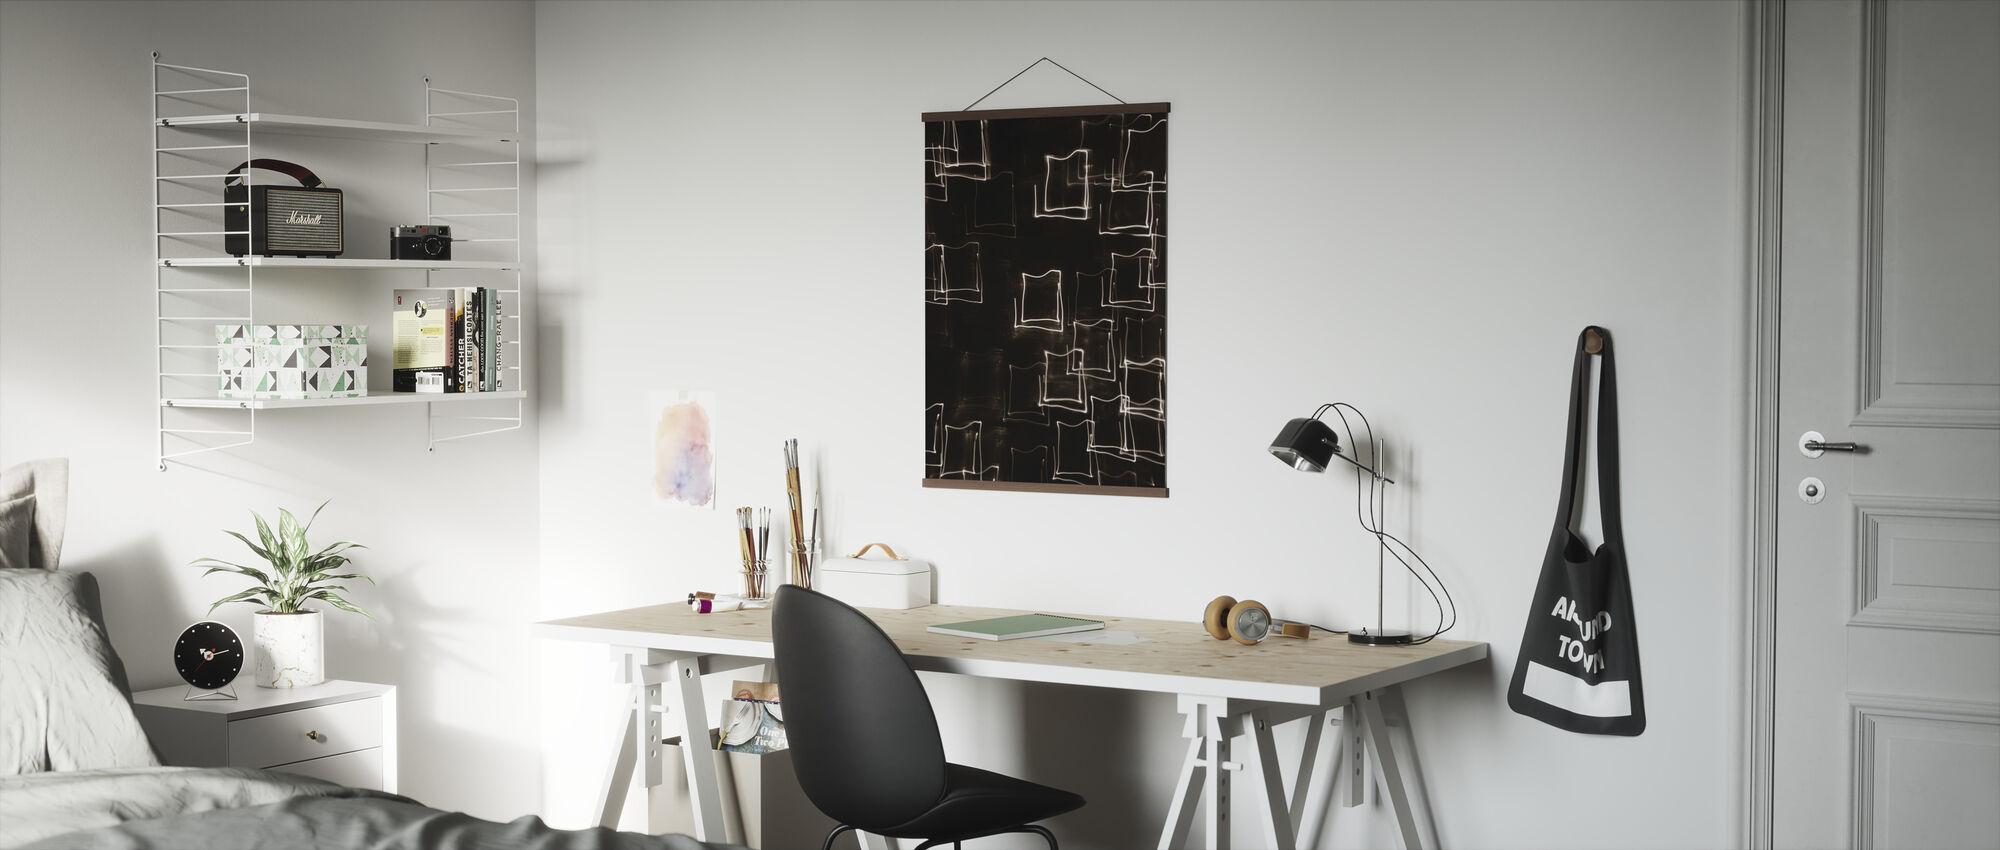 Motion Blur Light - Sepia - Poster - Office